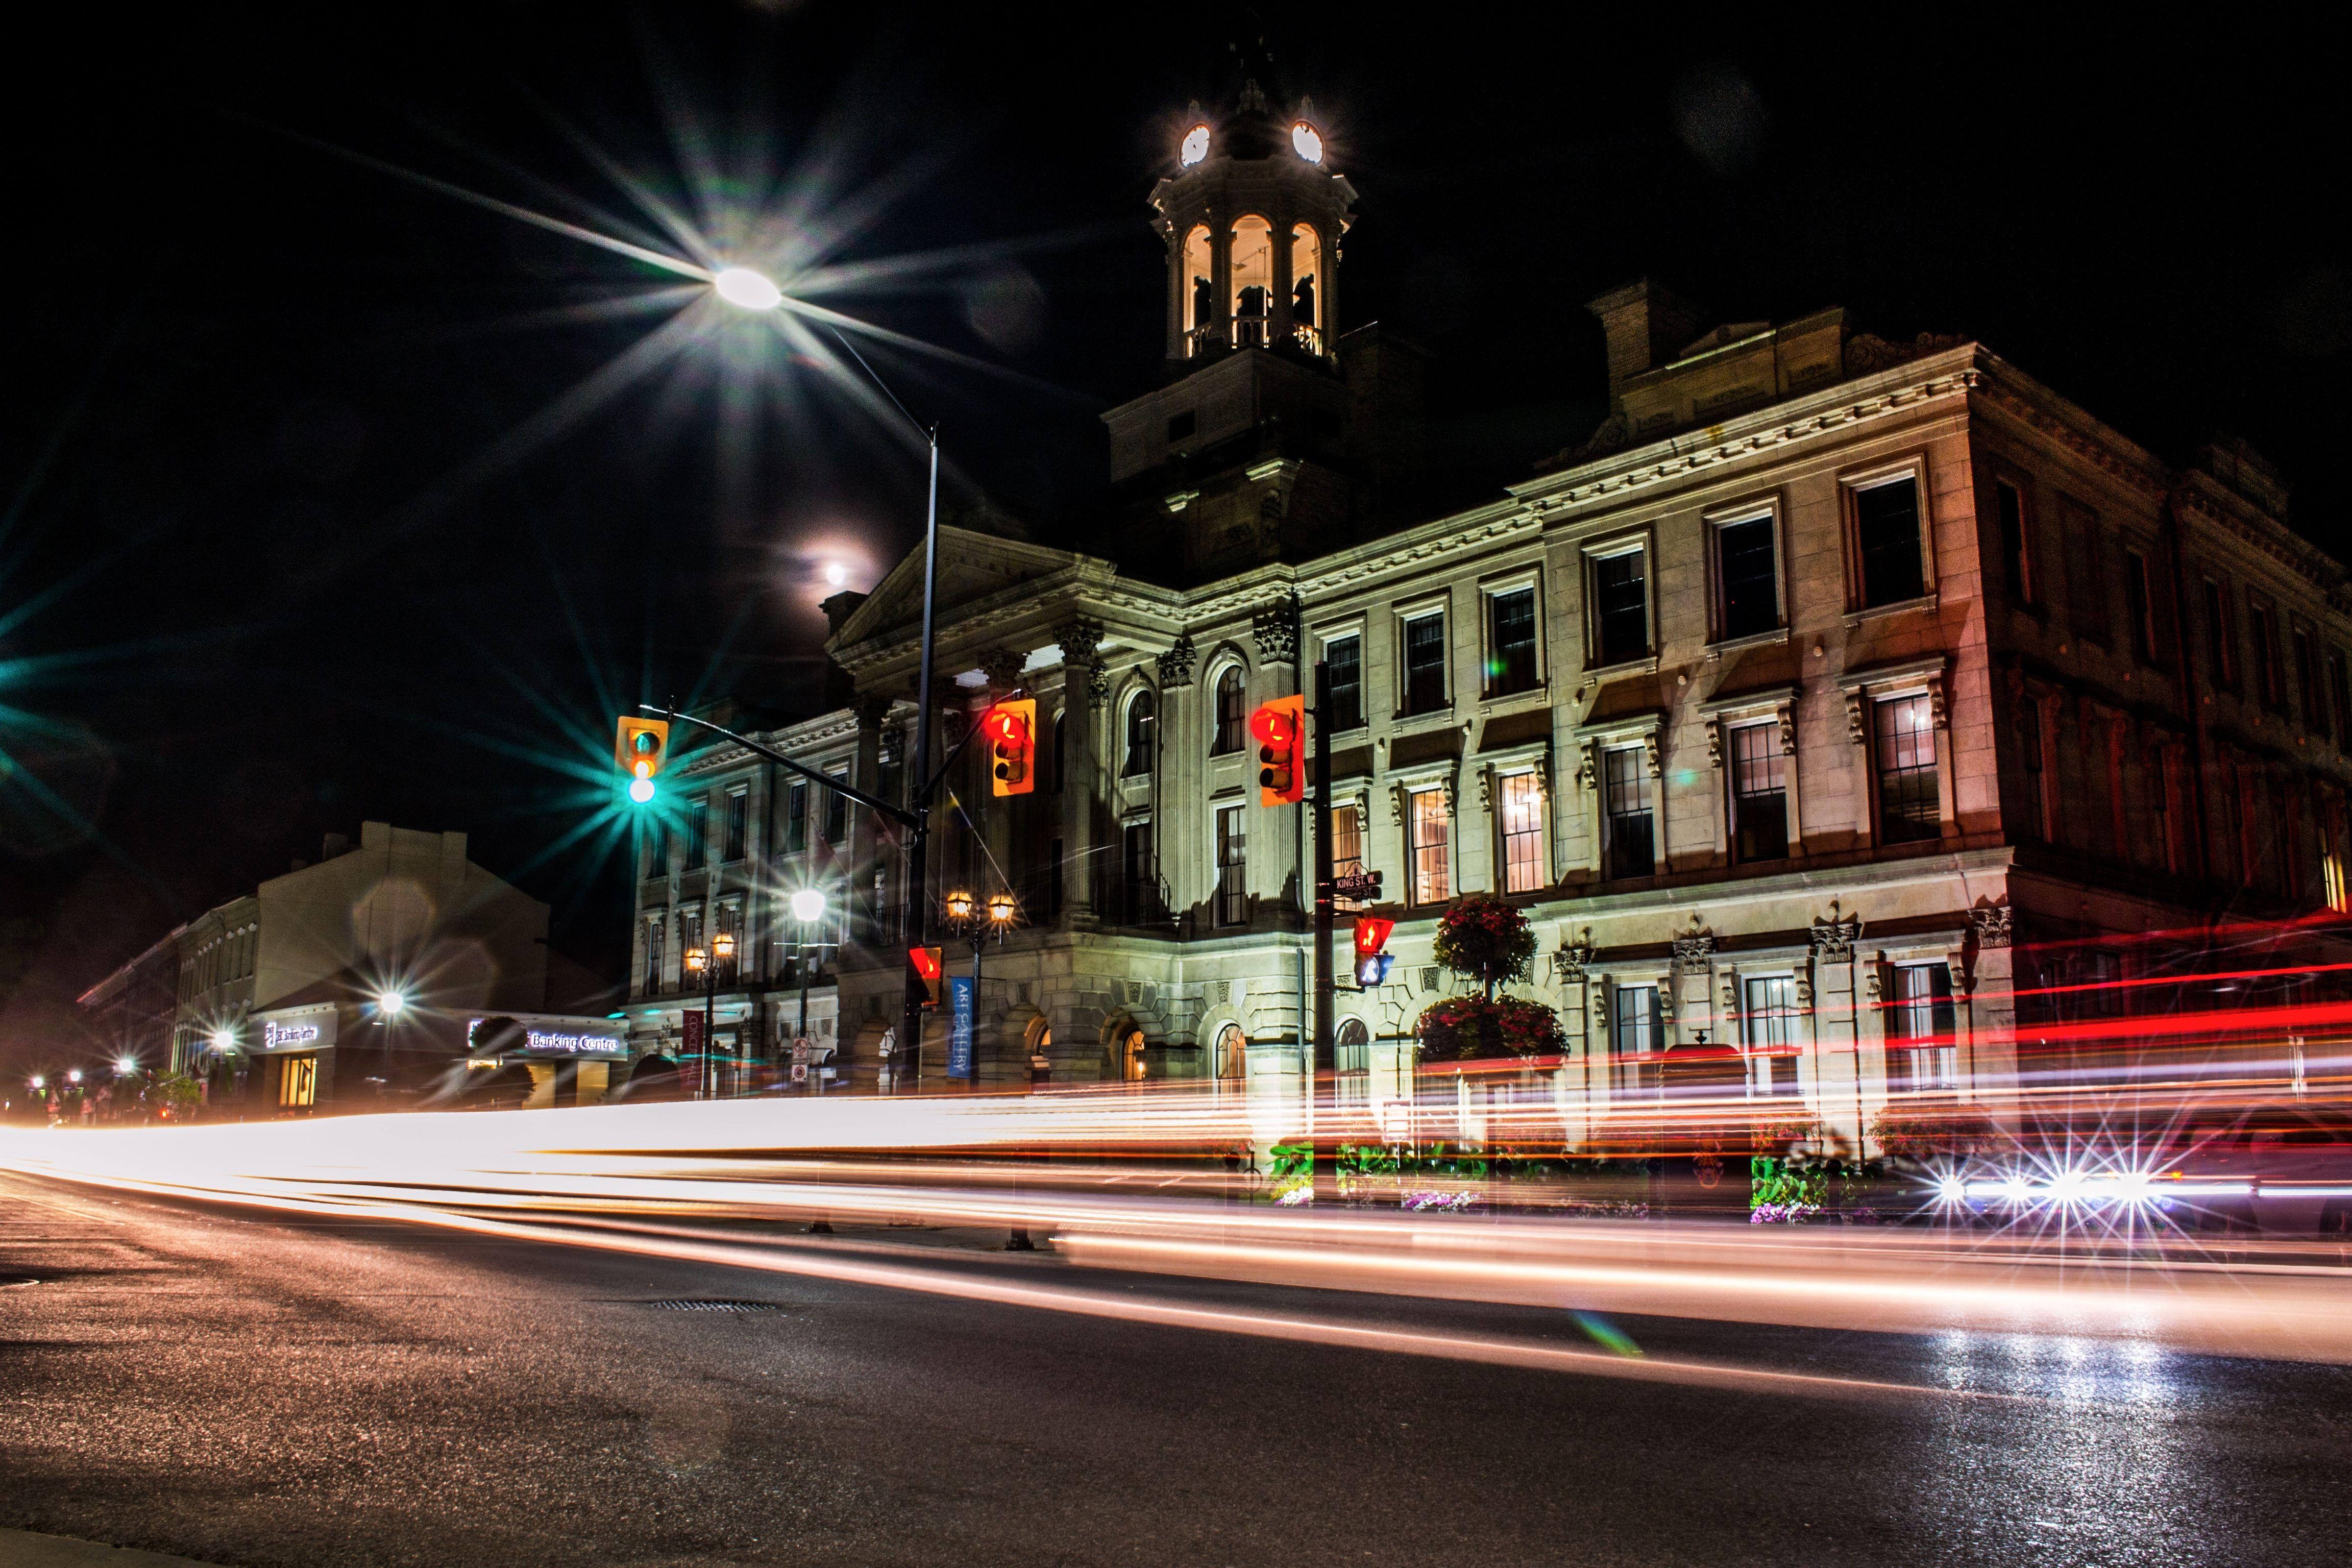 Long Exposure - Night photography - Light trails - City Hall